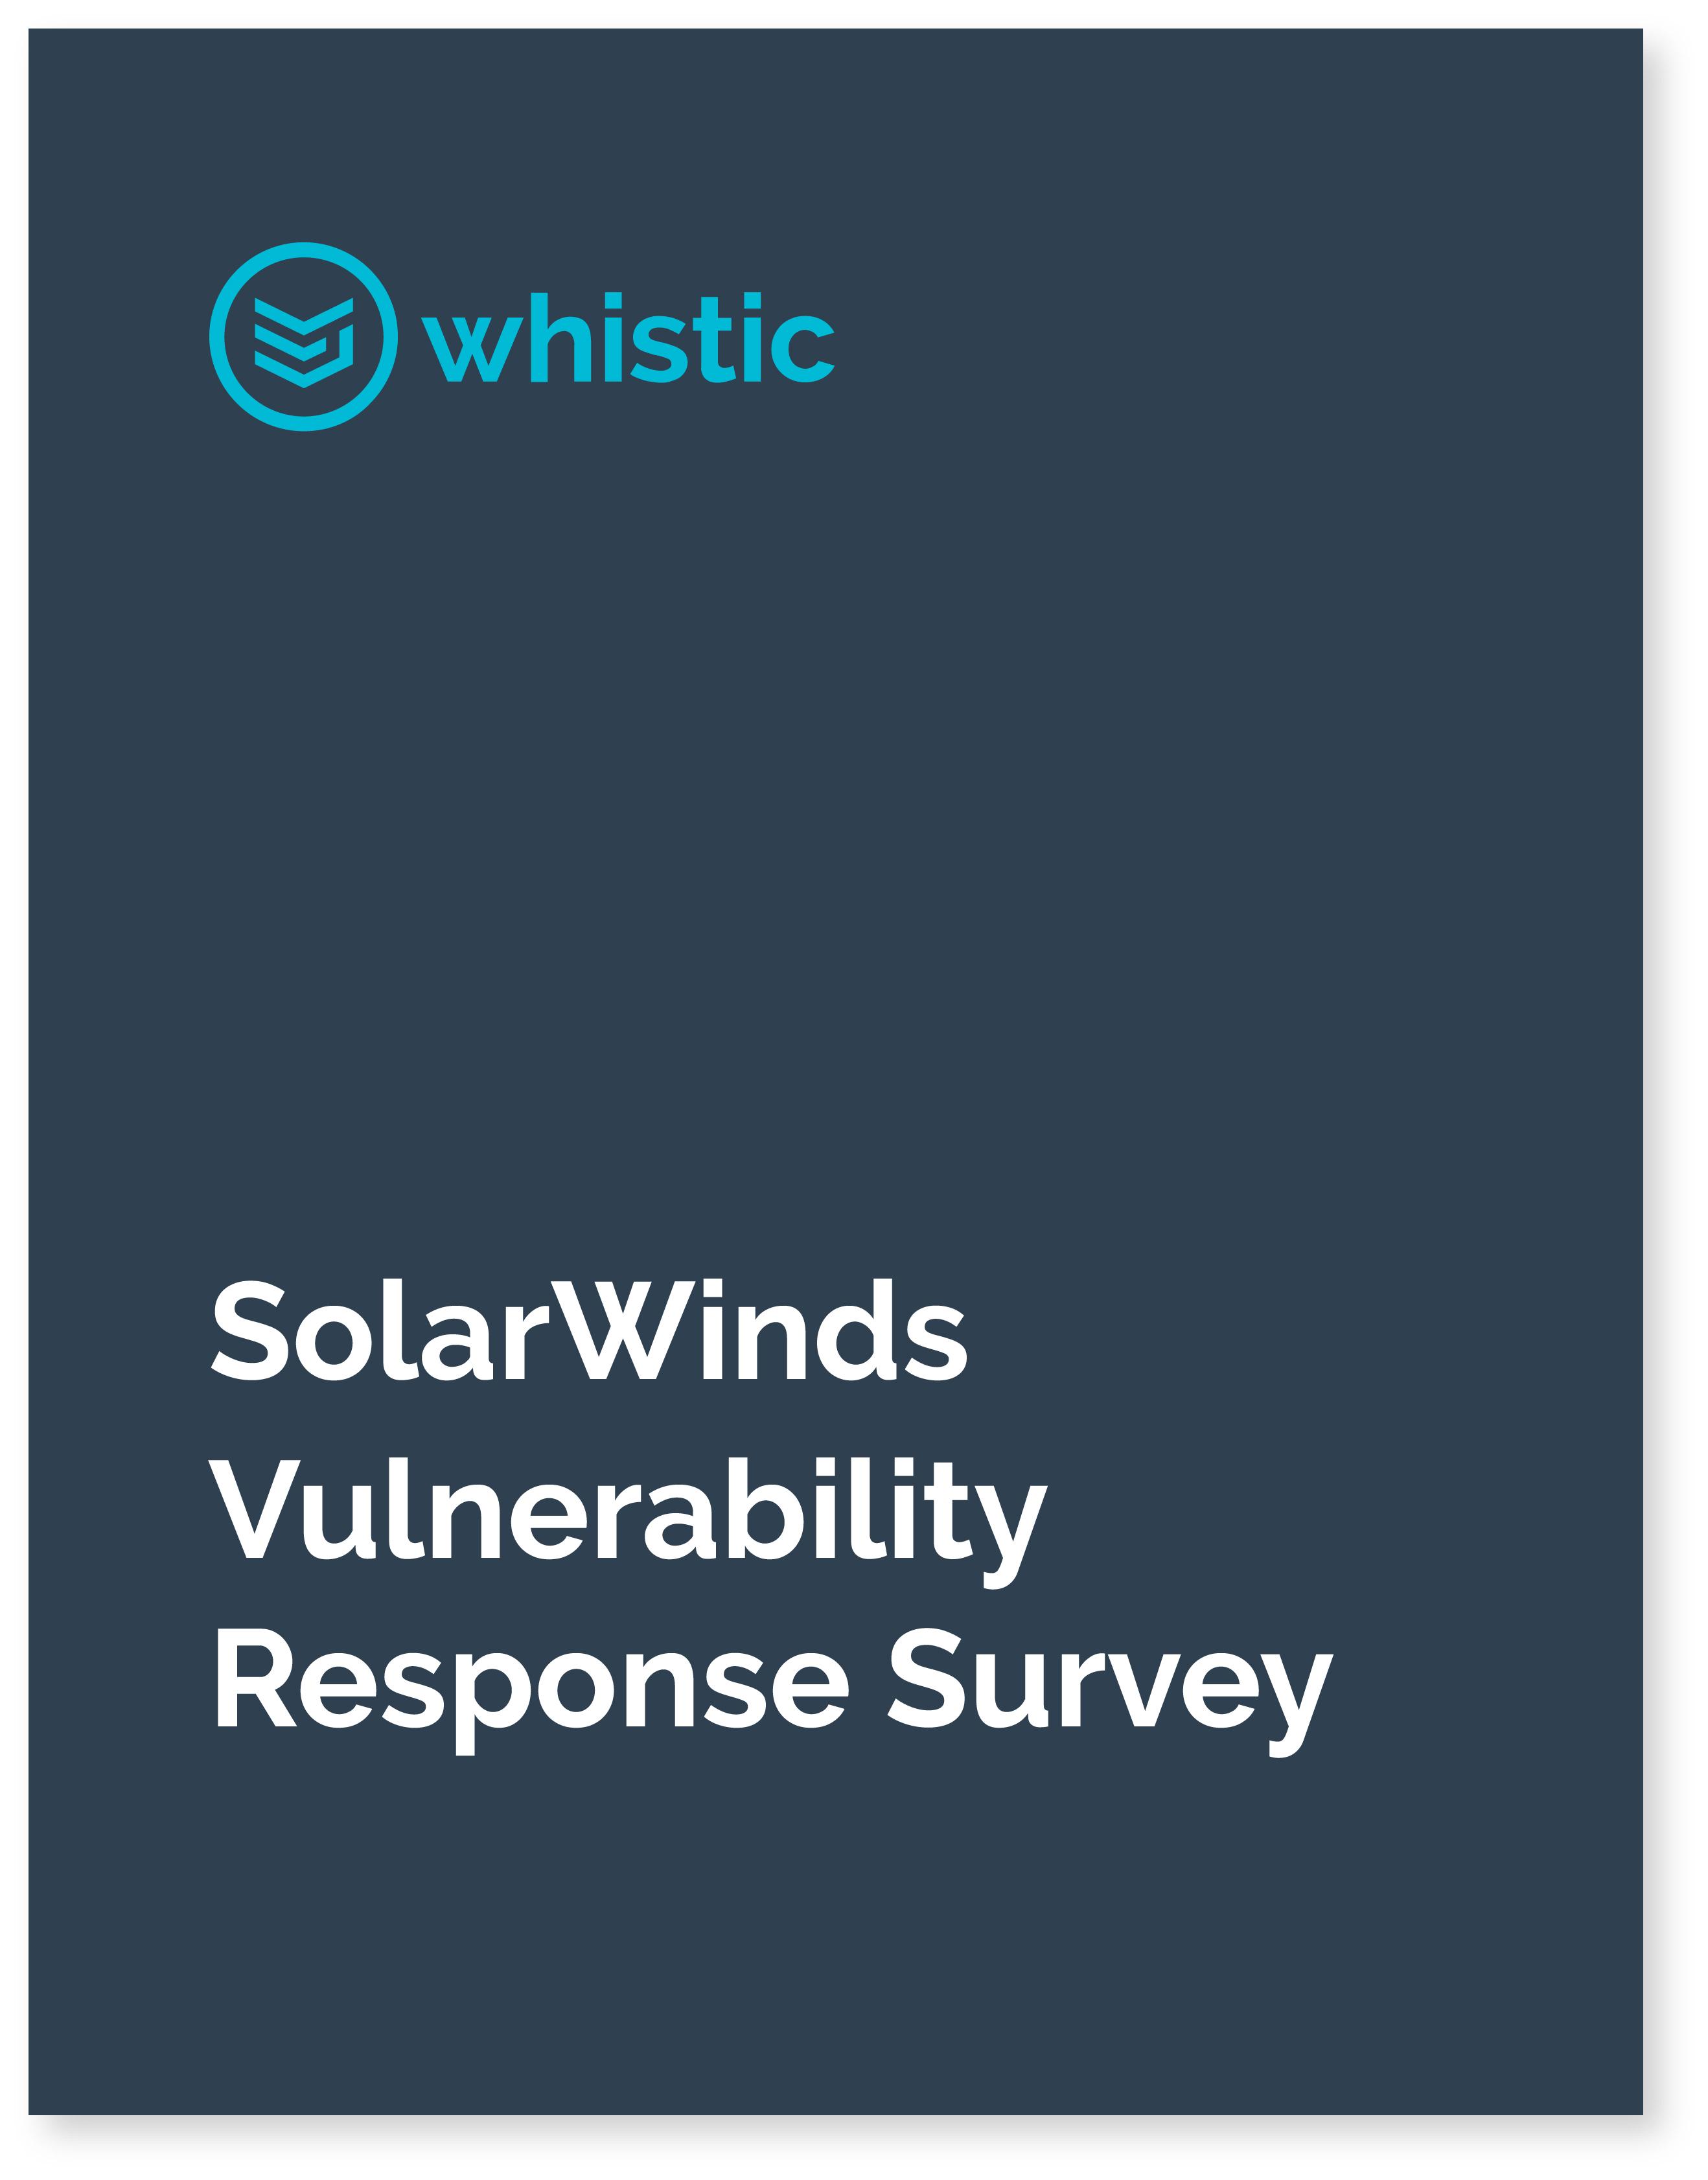 SolarWinds Survey Cover